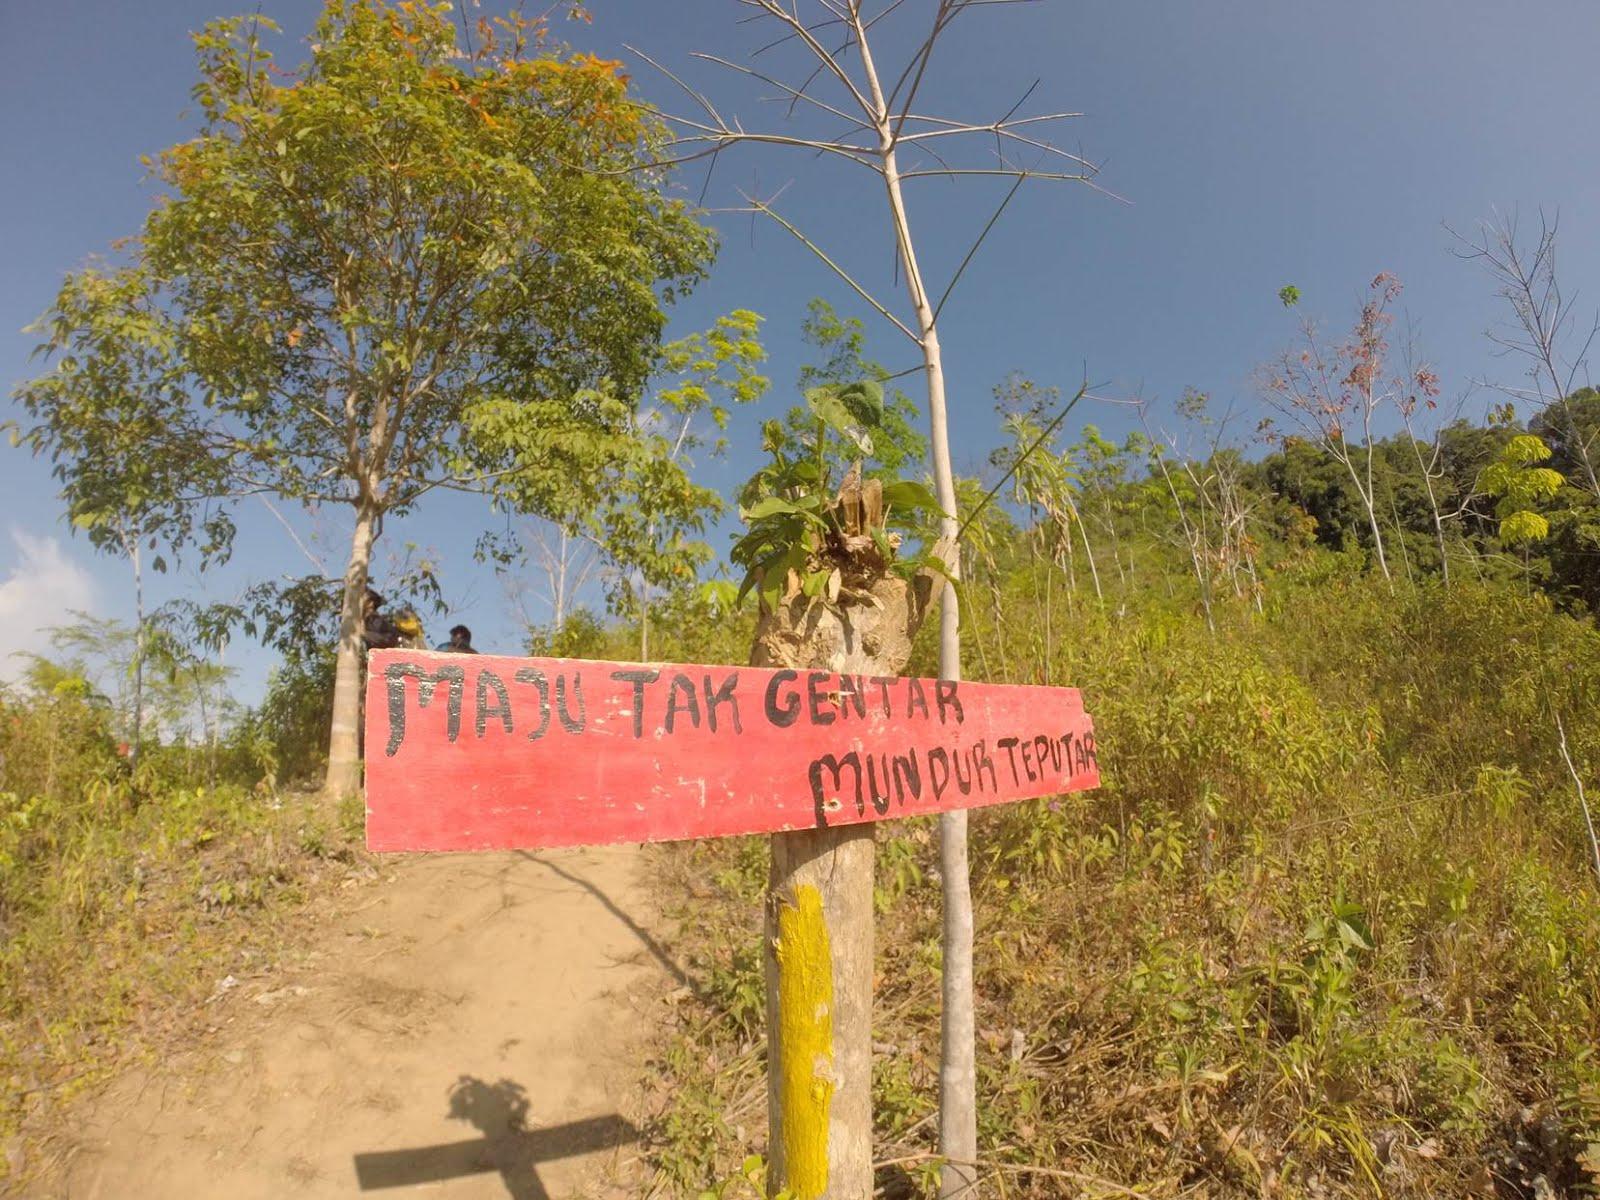 Destinasi wisata kalimantan selatan